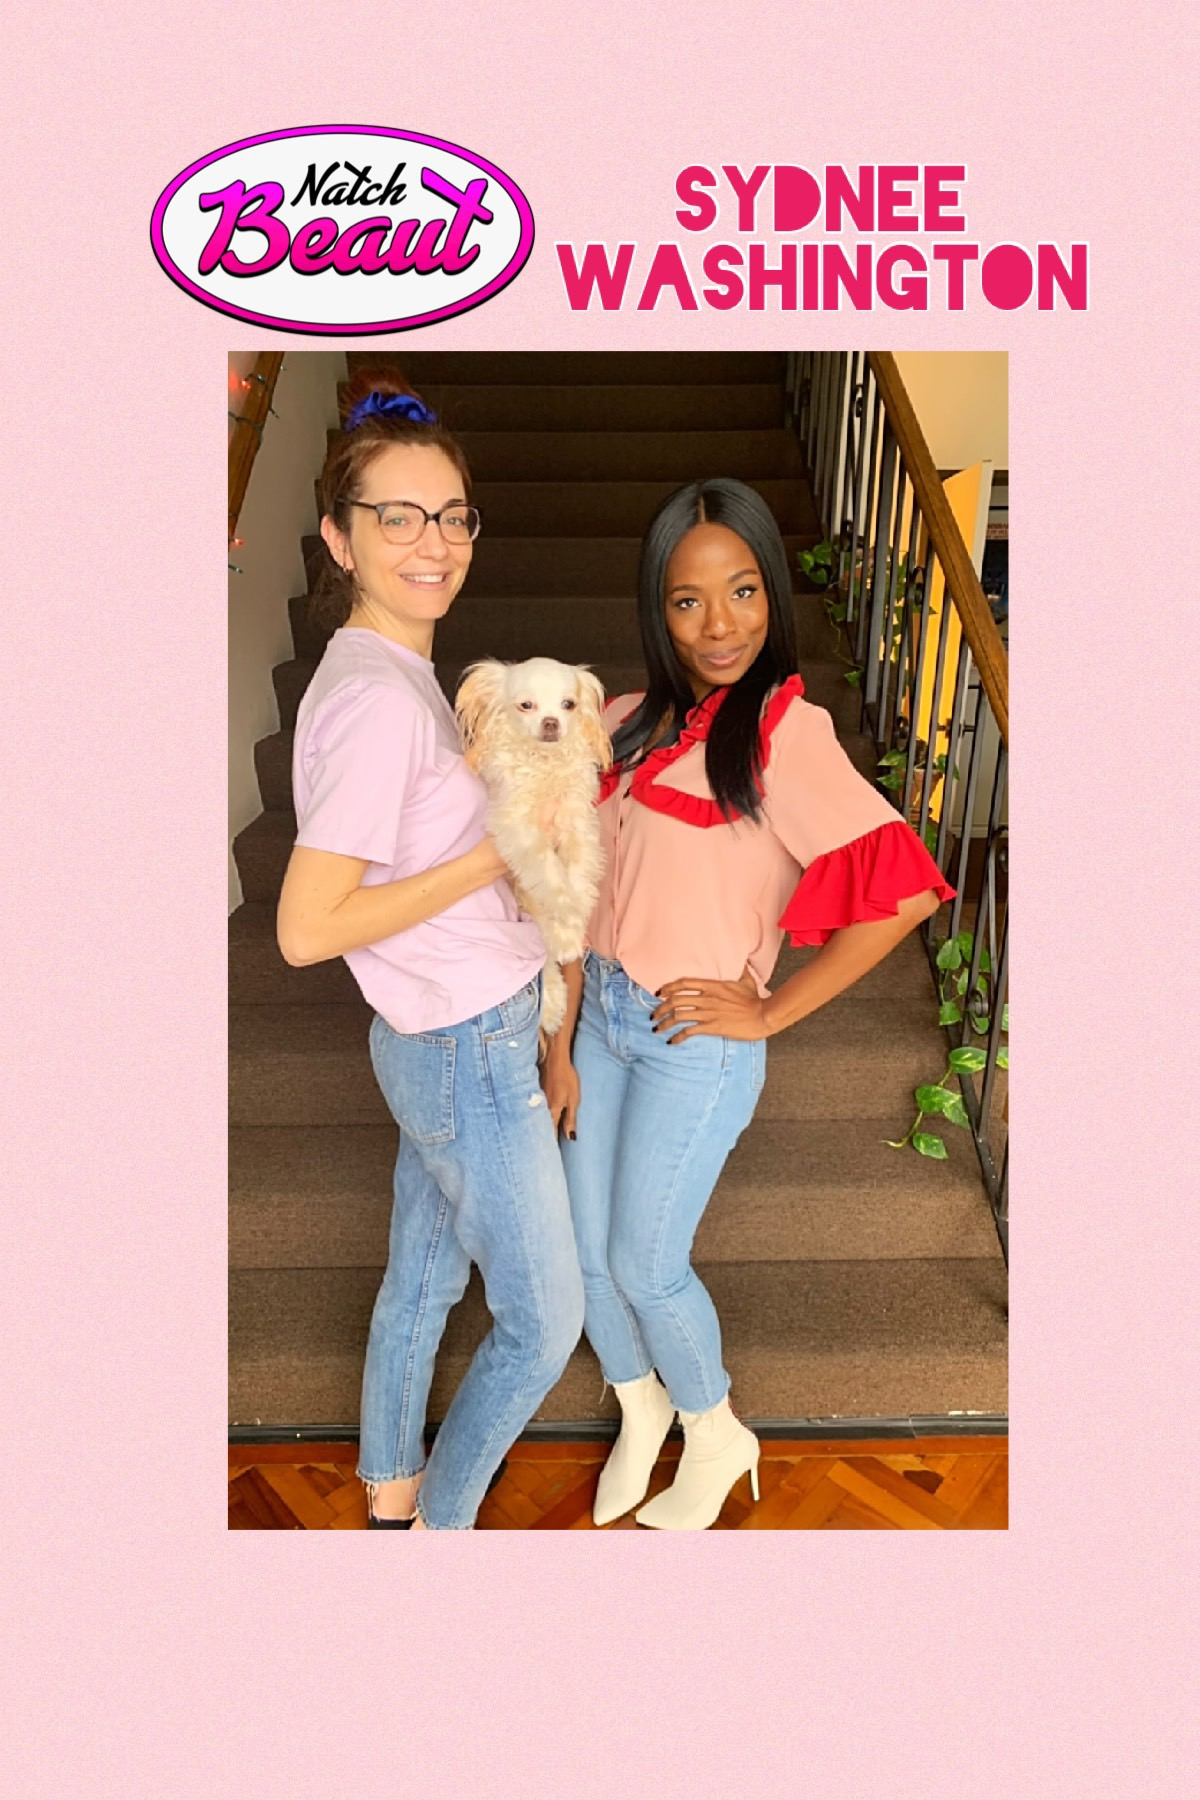 Jackie Johnson, the Chooch, and Sydnee Washington